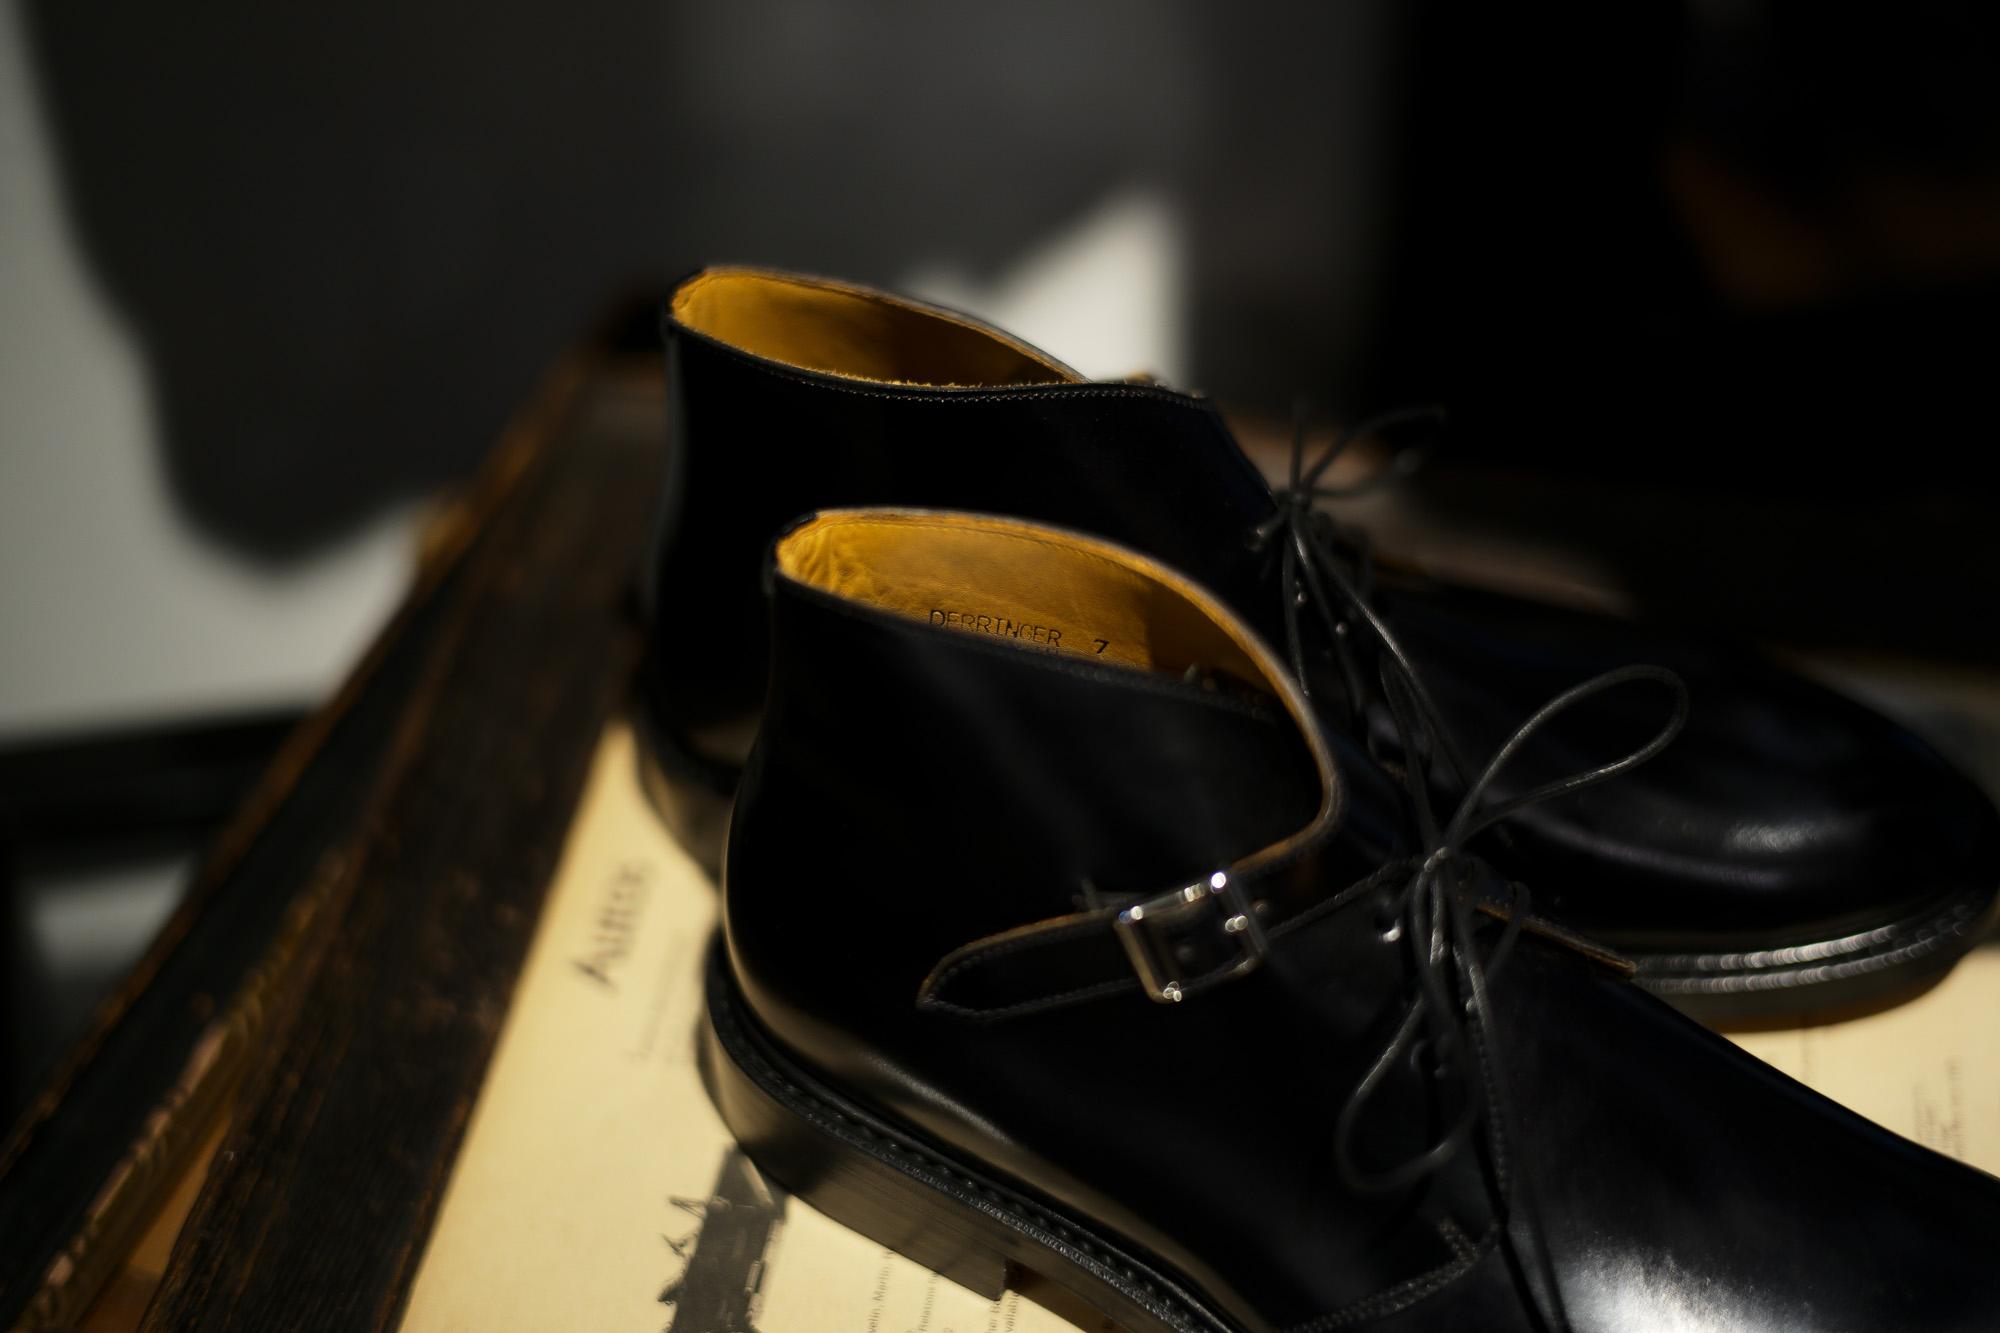 Cuervo (クエルボ) Derringer Cordovan(デリンジャー コードバン) Shell Cordovan シェルコードバンレザー Goodyear Welt Process  Double Leather Sole Chukka Boots チャッカブーツ  BLACK(ブラック・BLK) MADE IN JAPAN(日本製) 2018 春夏新作 愛知 名古屋 Alto e Diritto アルト エ デリット クエルボ チャッカブーツ コードバン 5(24),5.5(24.5),6(25),6.5(25.5),7(26),7.5(26.5),8(27),8.5(27.5),9(28)